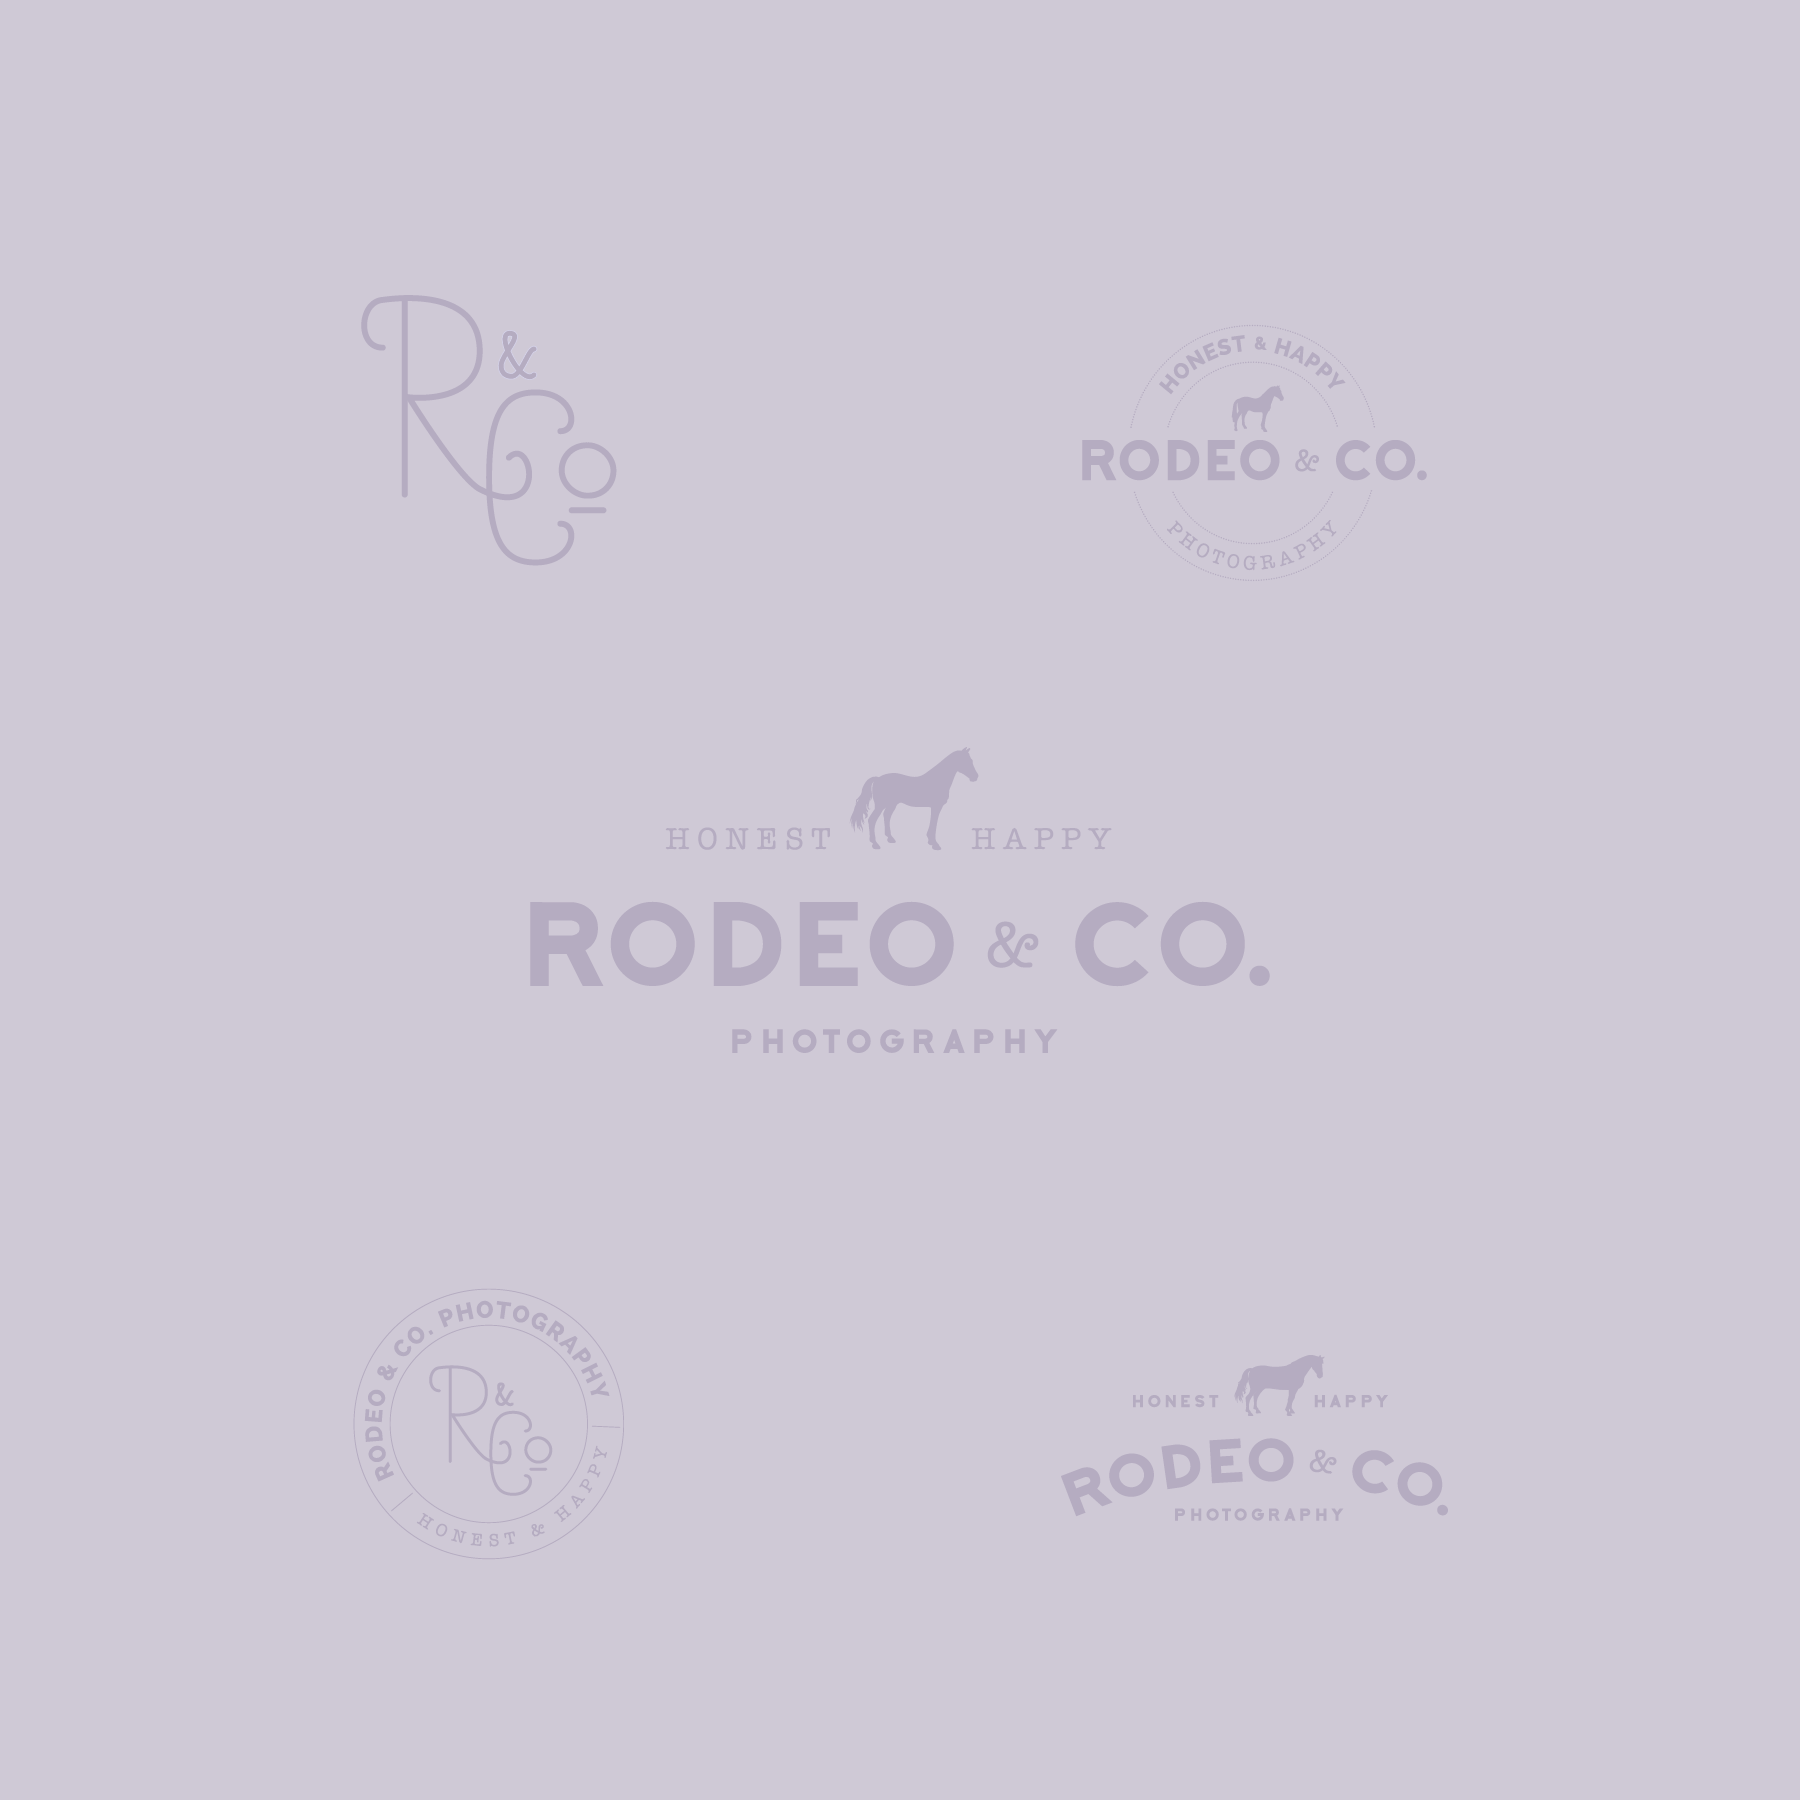 Rodeo & Co. Photography Logo Design